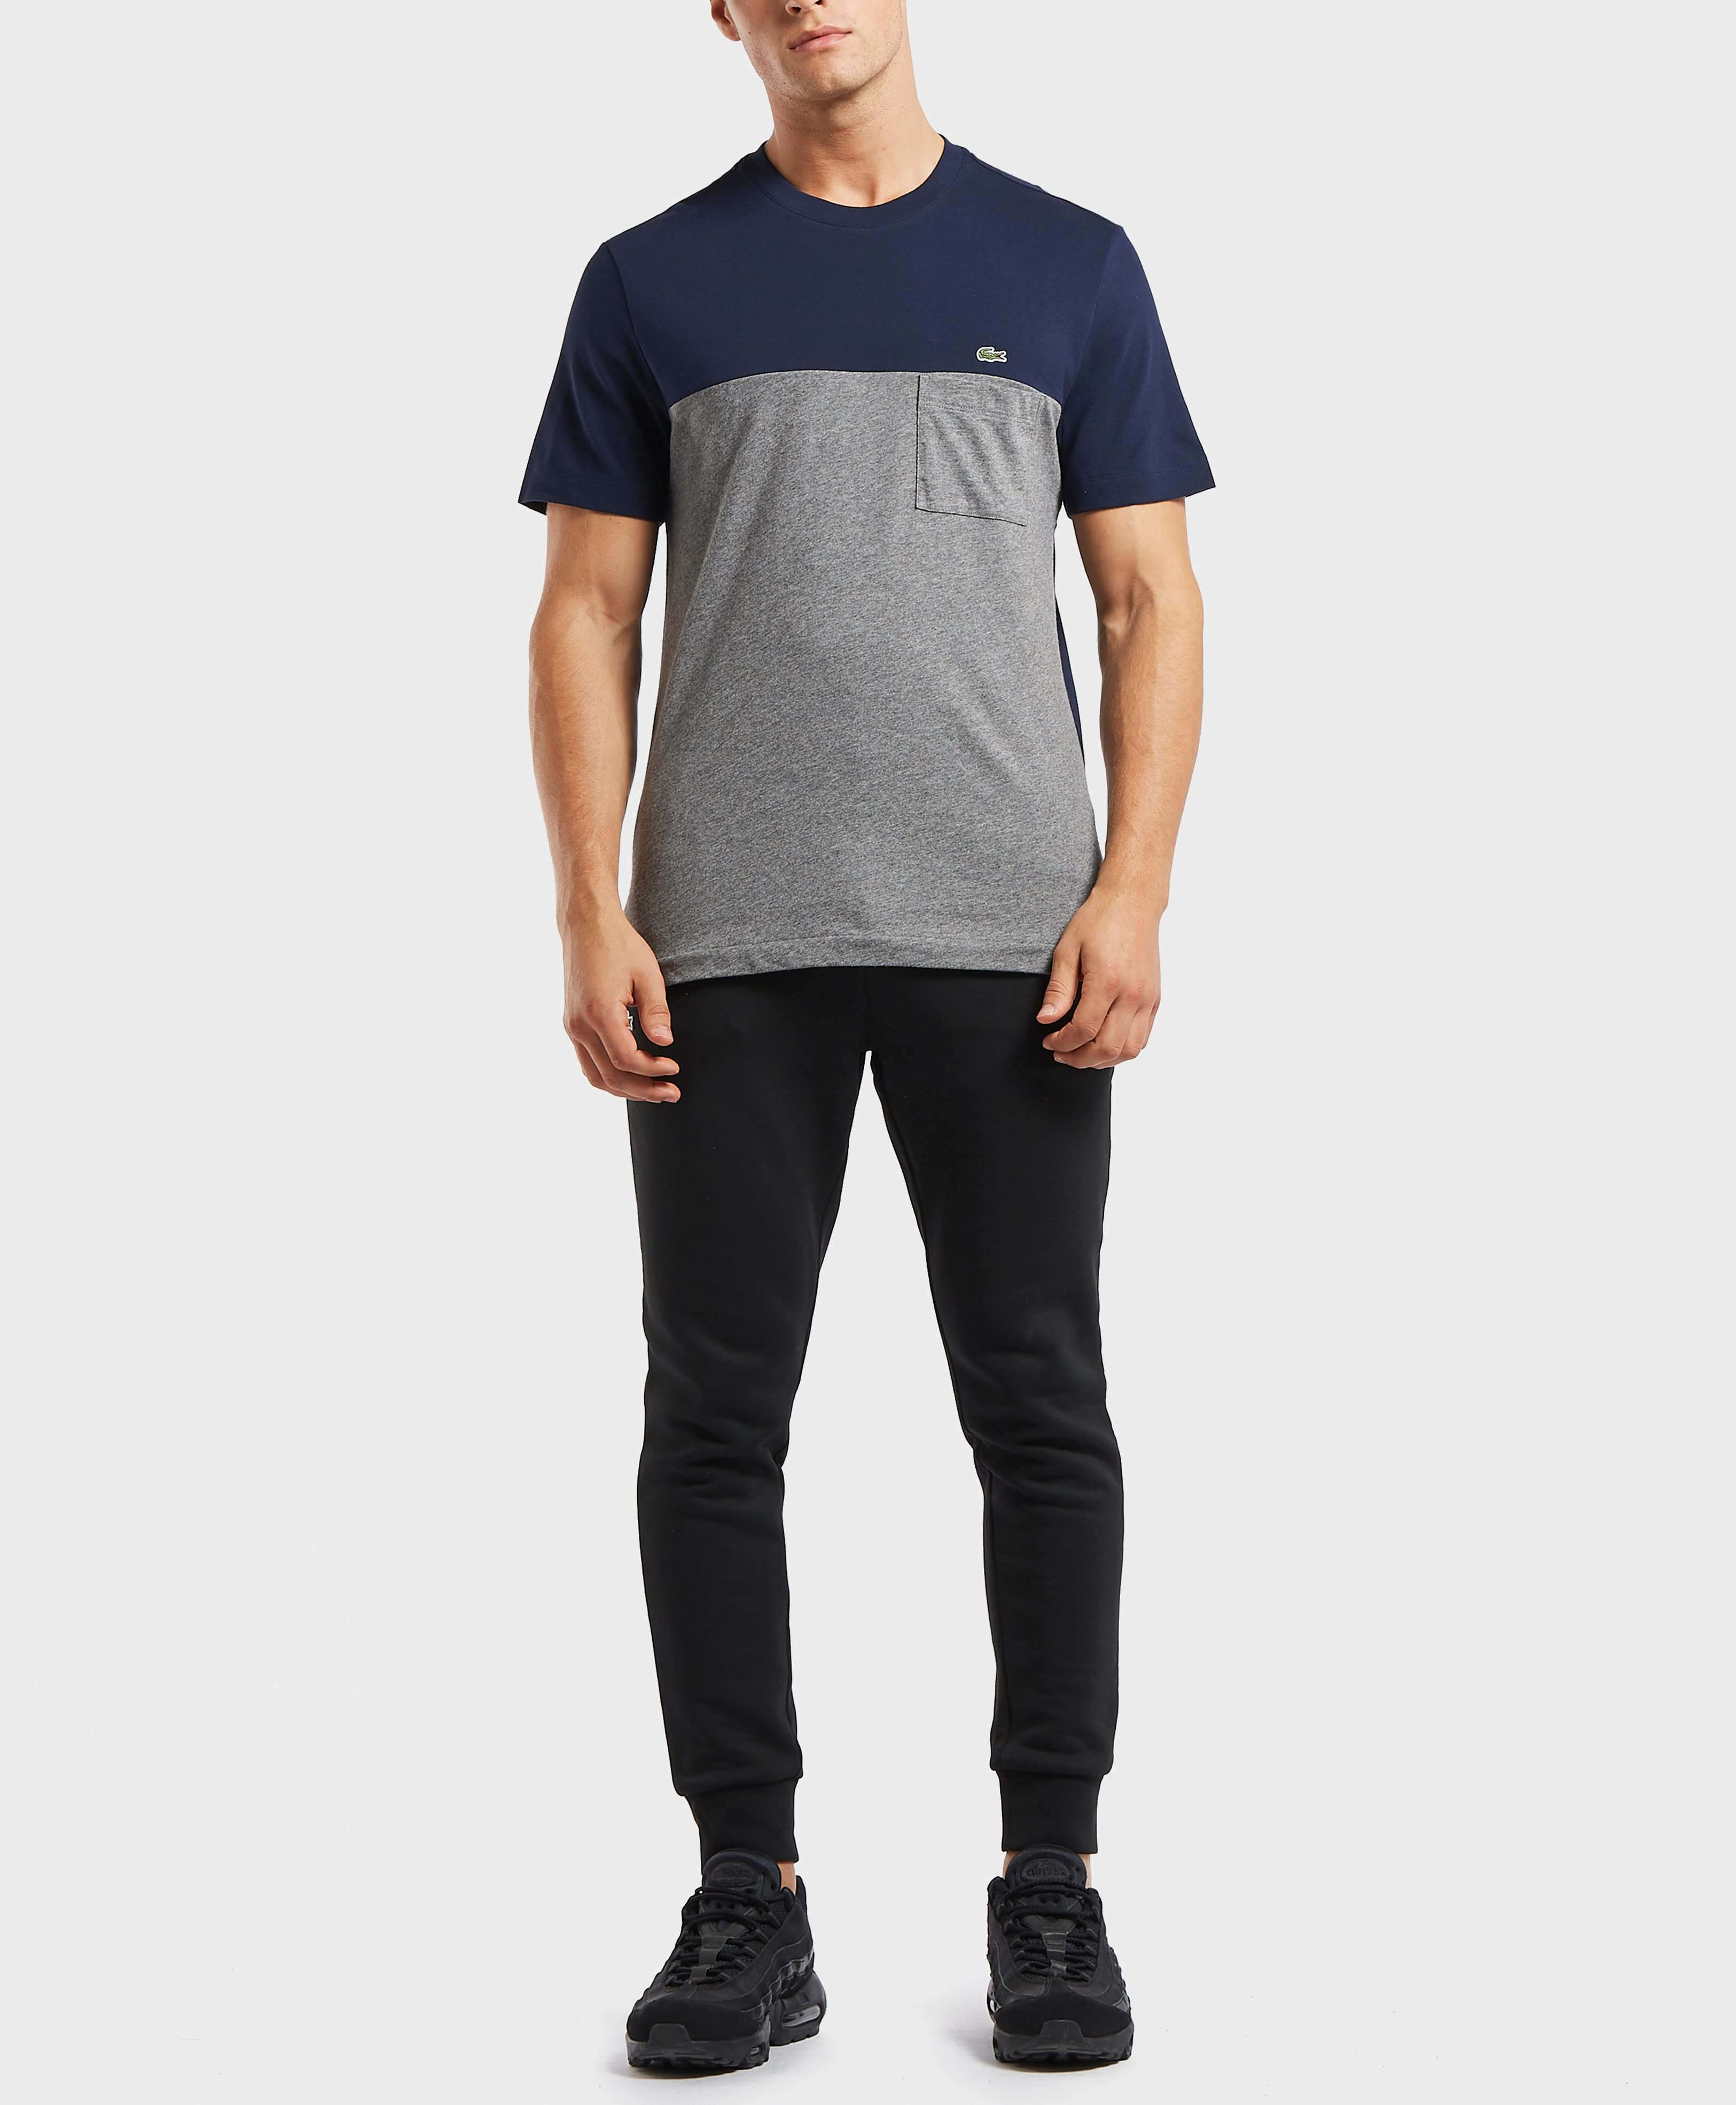 Lacoste Mix Block Short Sleeve T-Shirt